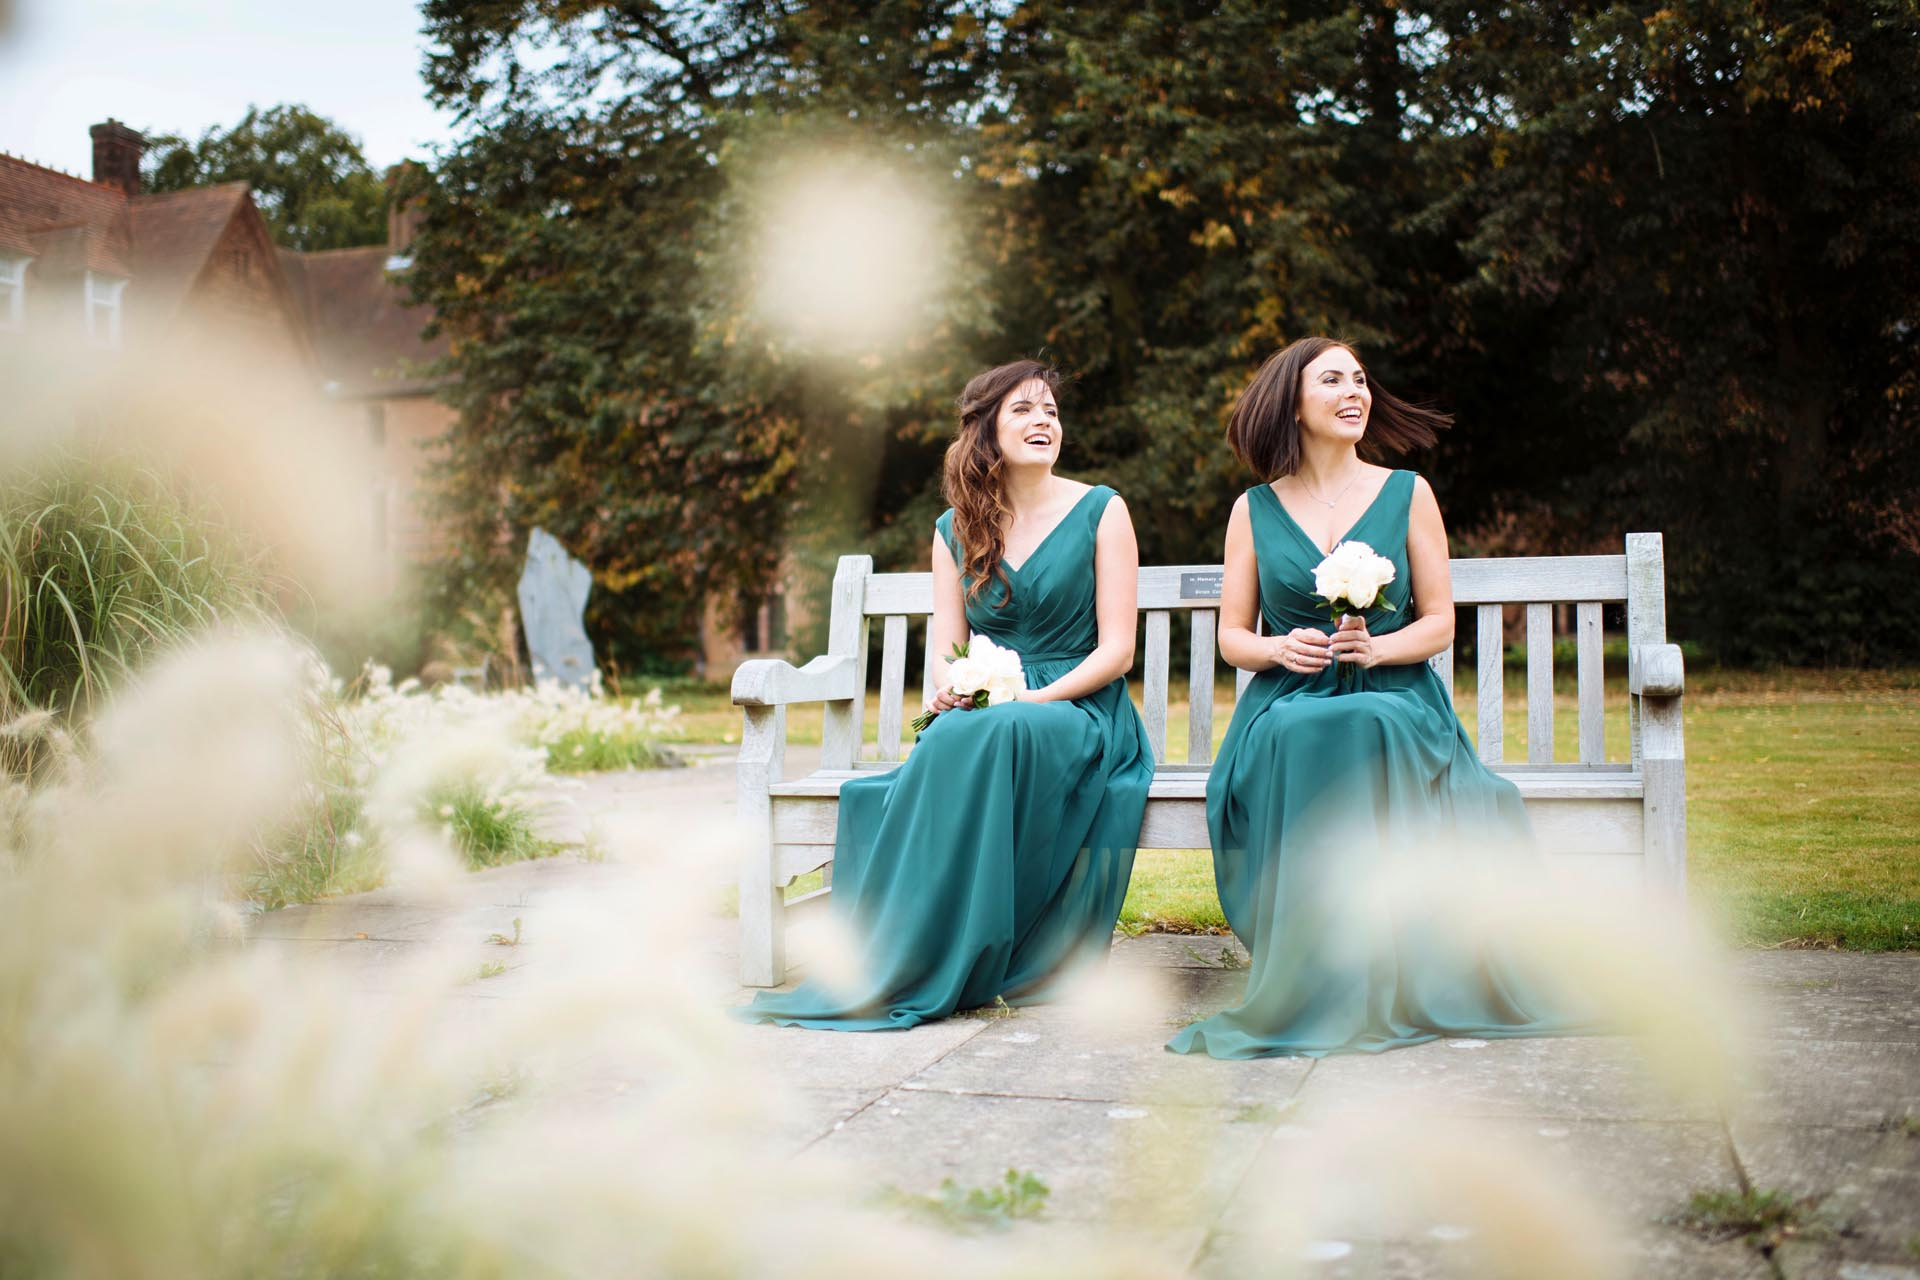 Družičky na svatbě